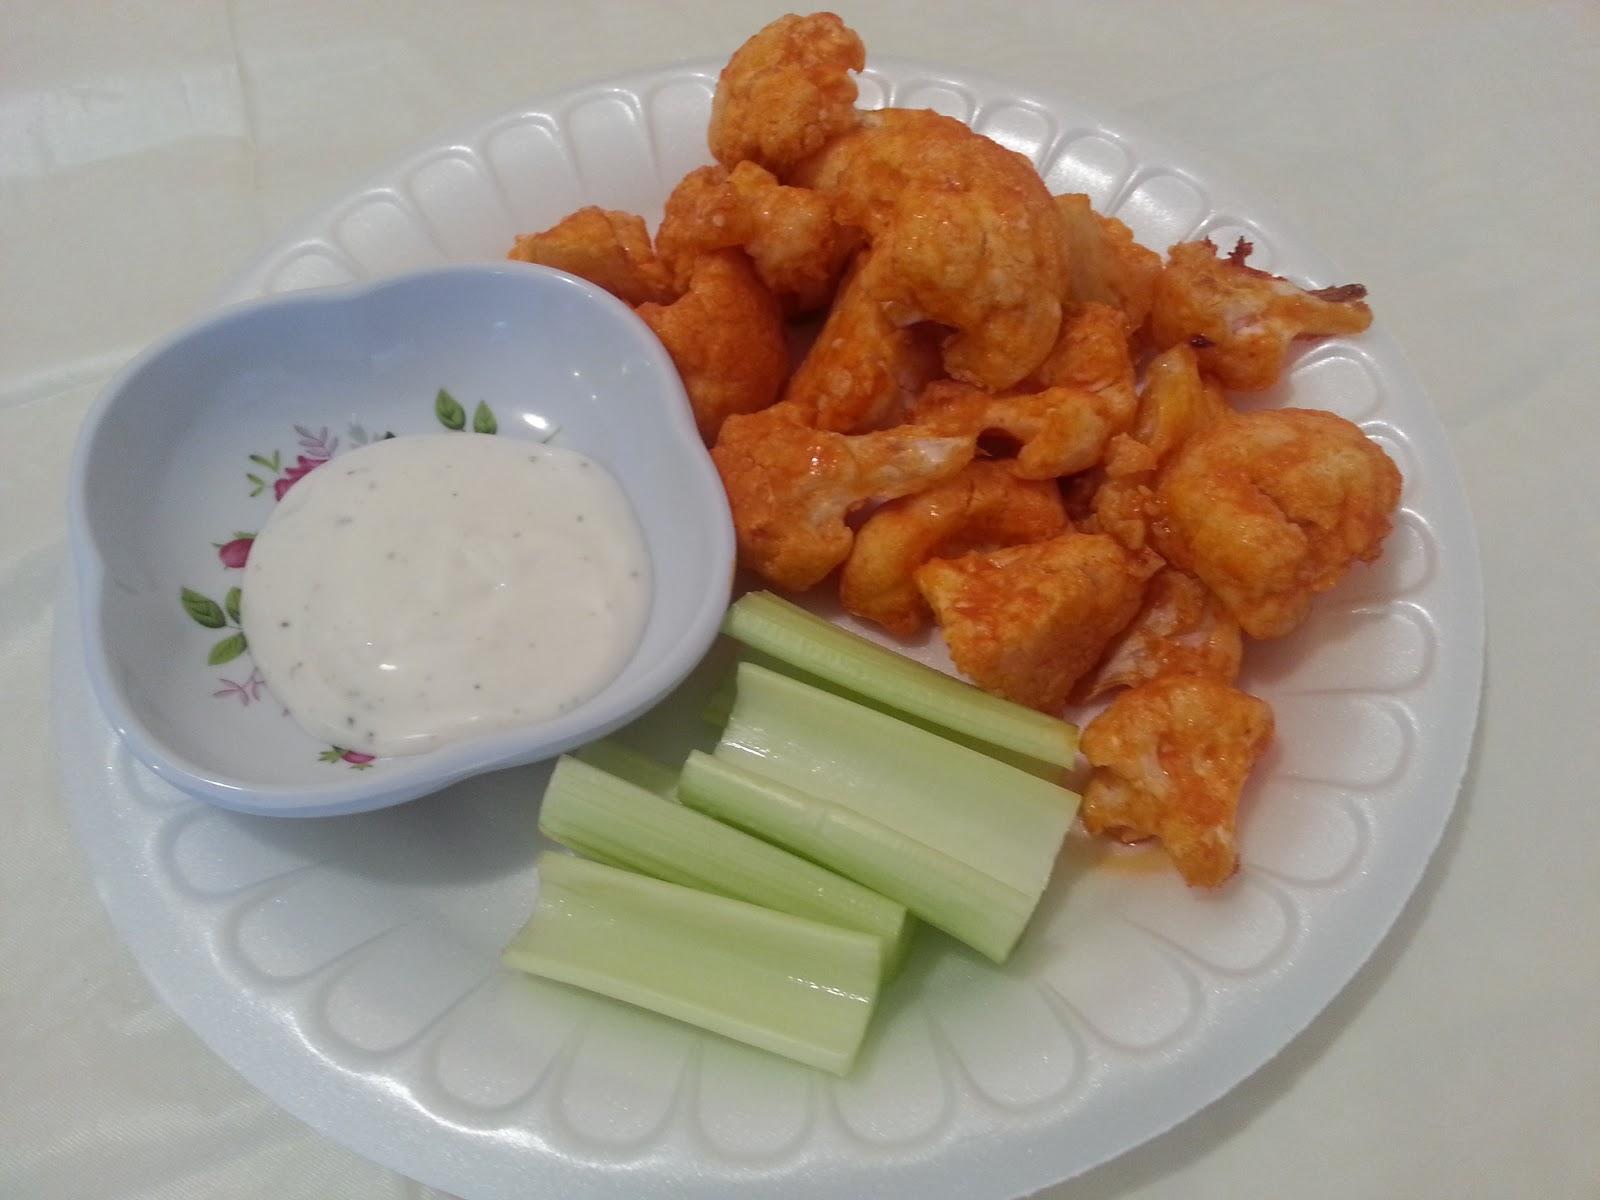 HCF: Spicy Buffalo Cauliflower Bites